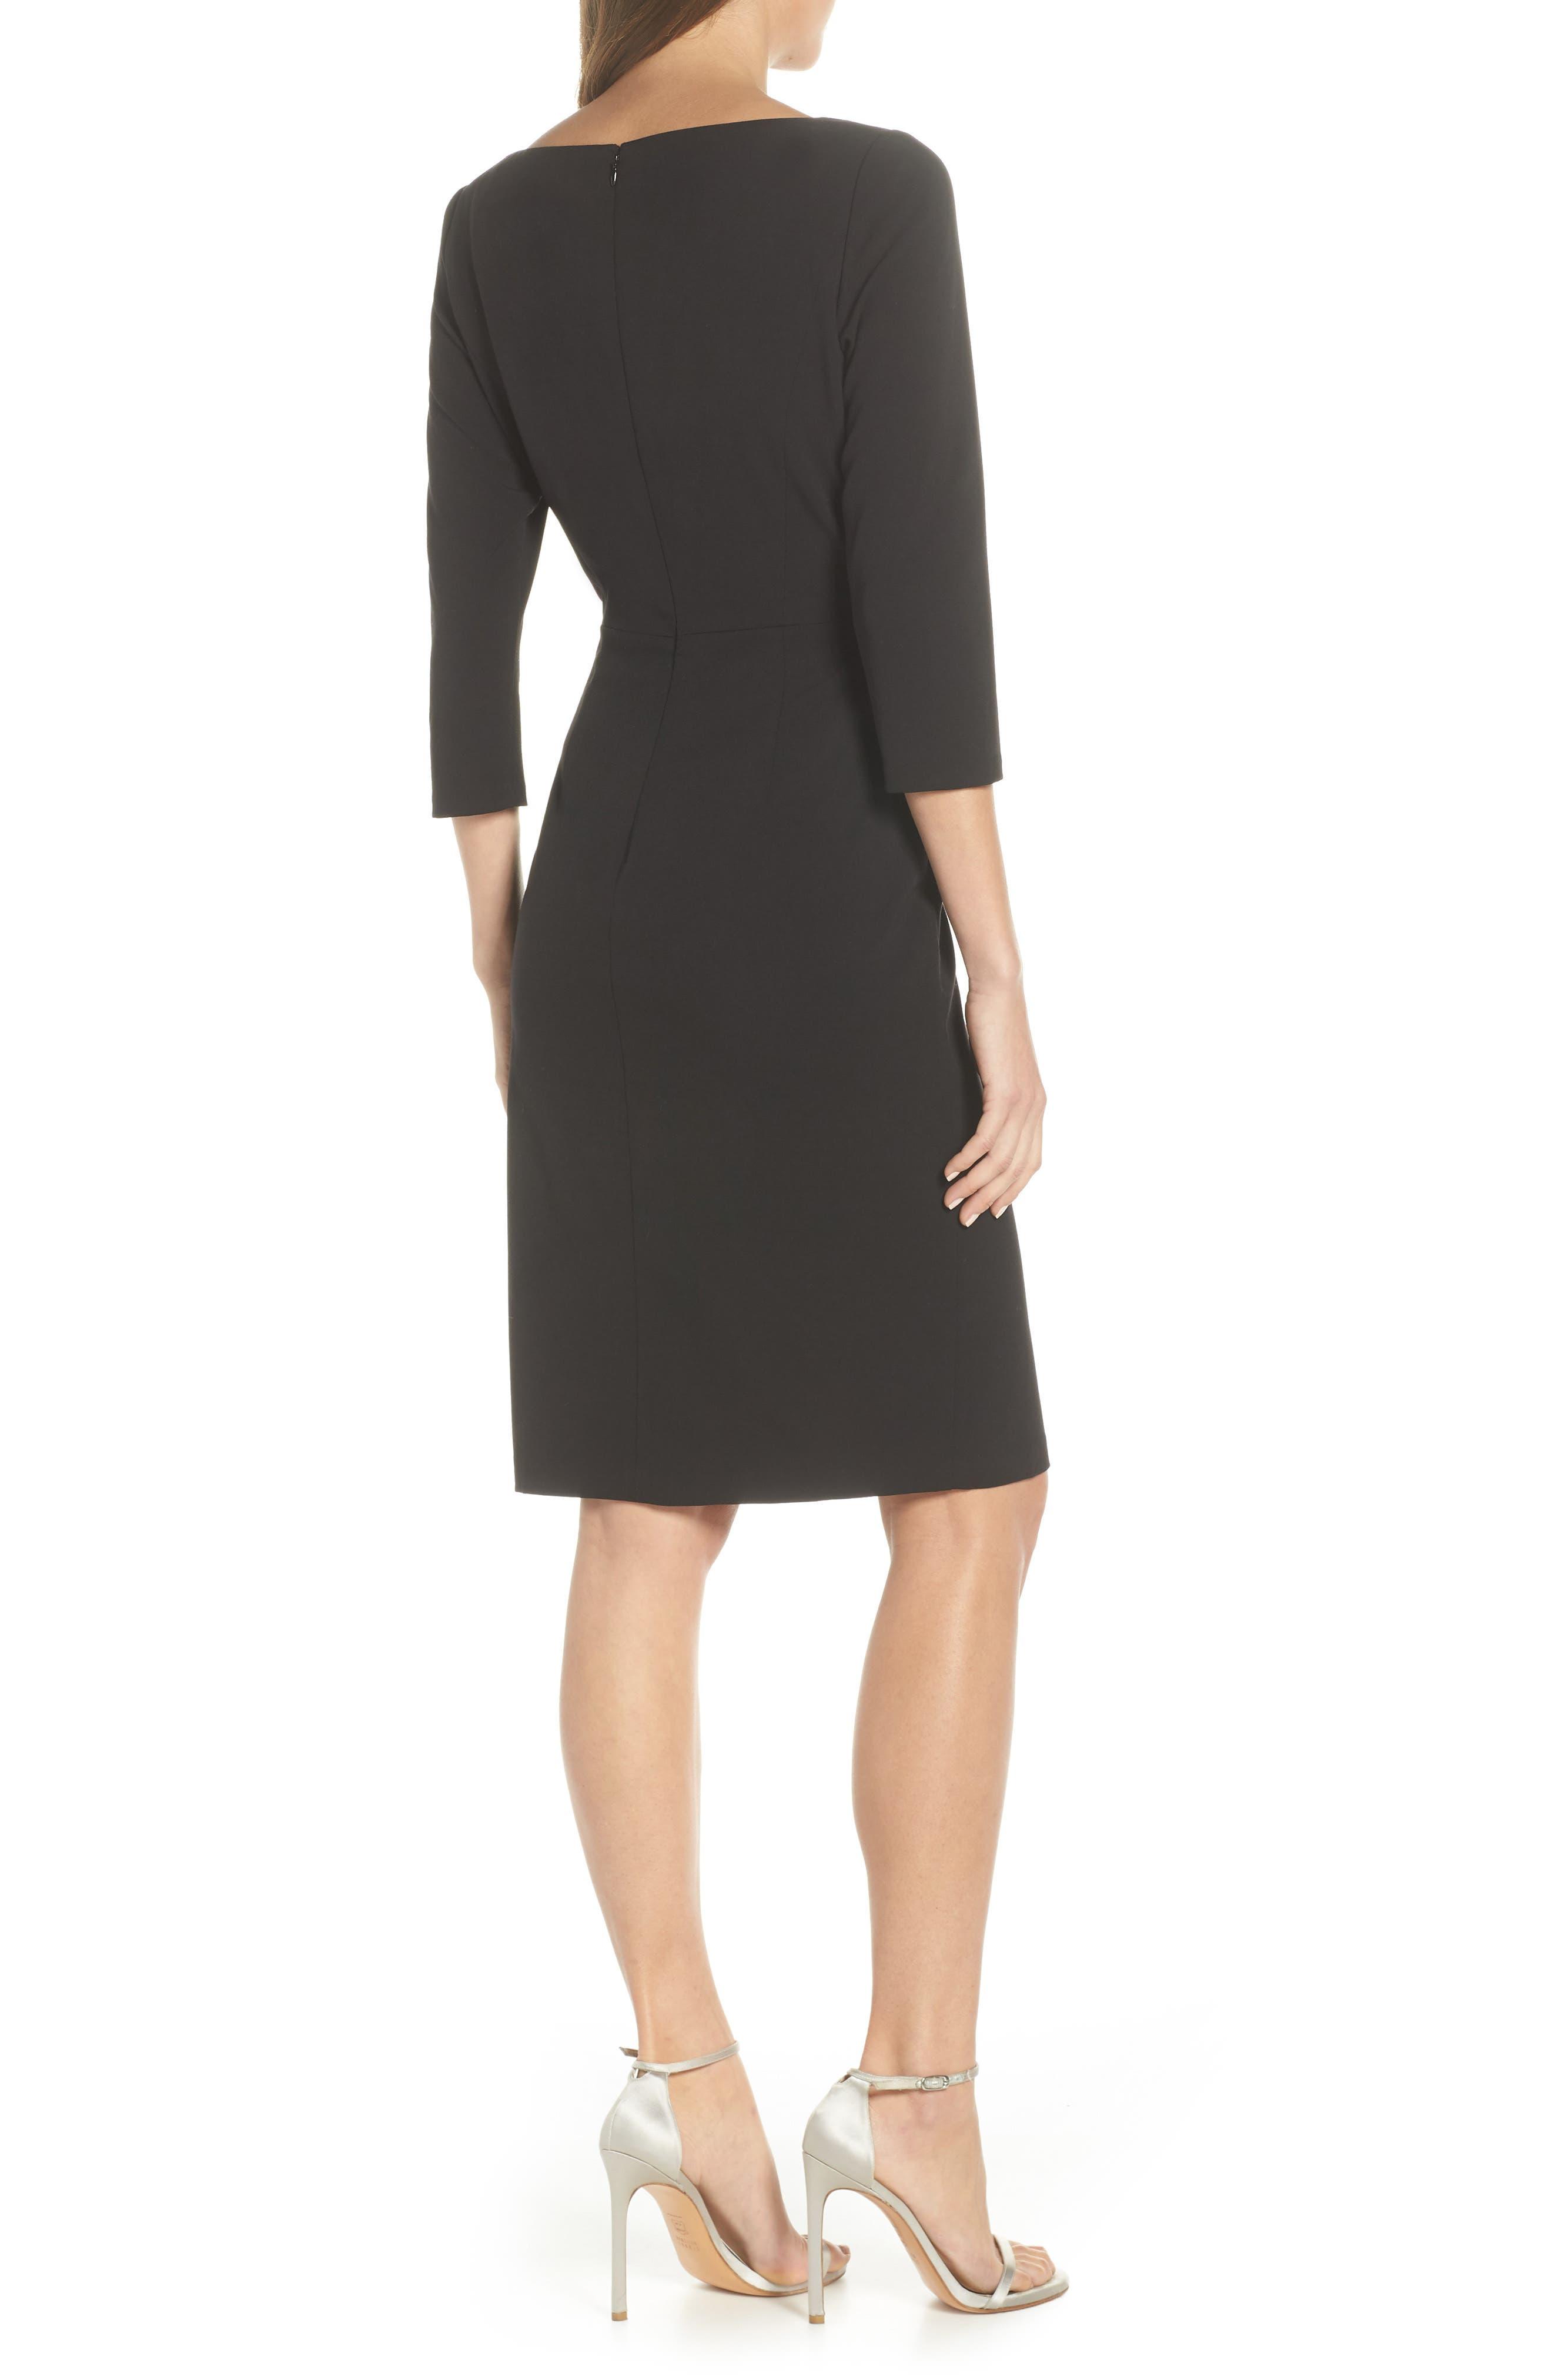 VINCE CAMUTO,                             Angled Ruffle Sheath Dress,                             Alternate thumbnail 2, color,                             BLACK